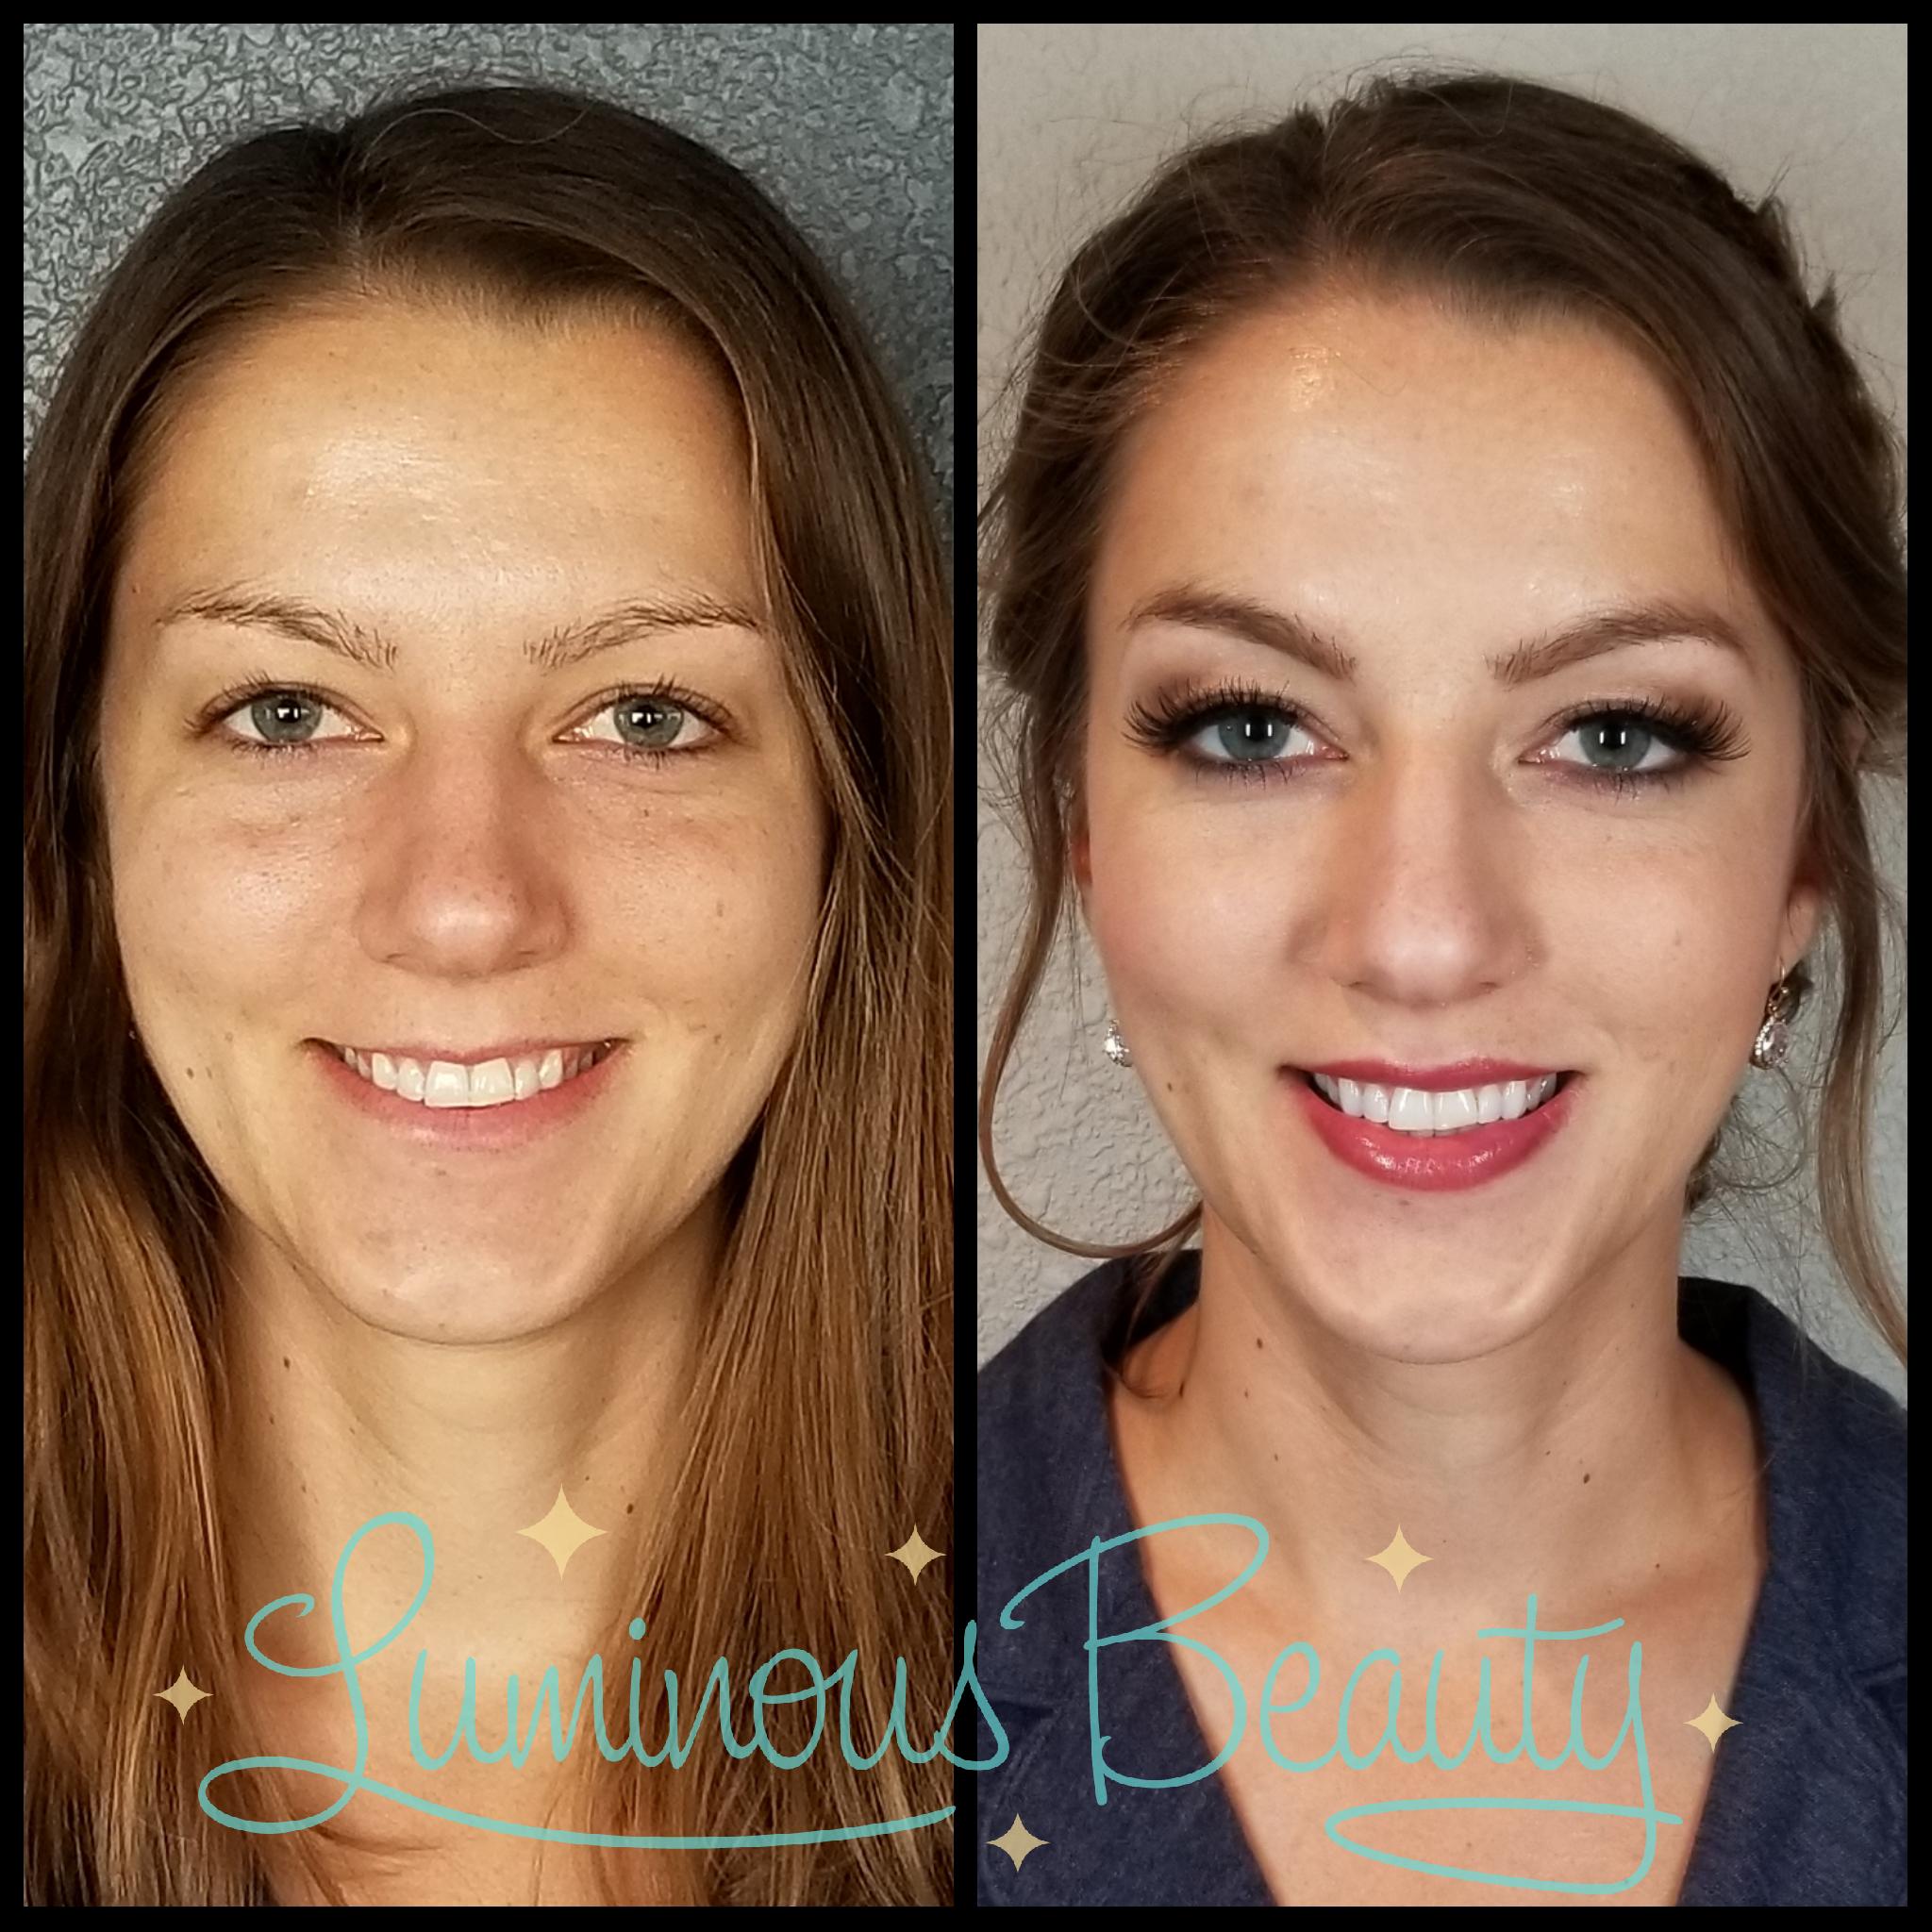 Bridesmaid's Hair & Makeup. Soft Looping Updo with Braid. Plum Smokey Eye, Plum Lips, False Lashes. Luminous Beauty Makeup Artist and Luminous Beauty Hairstylist..png